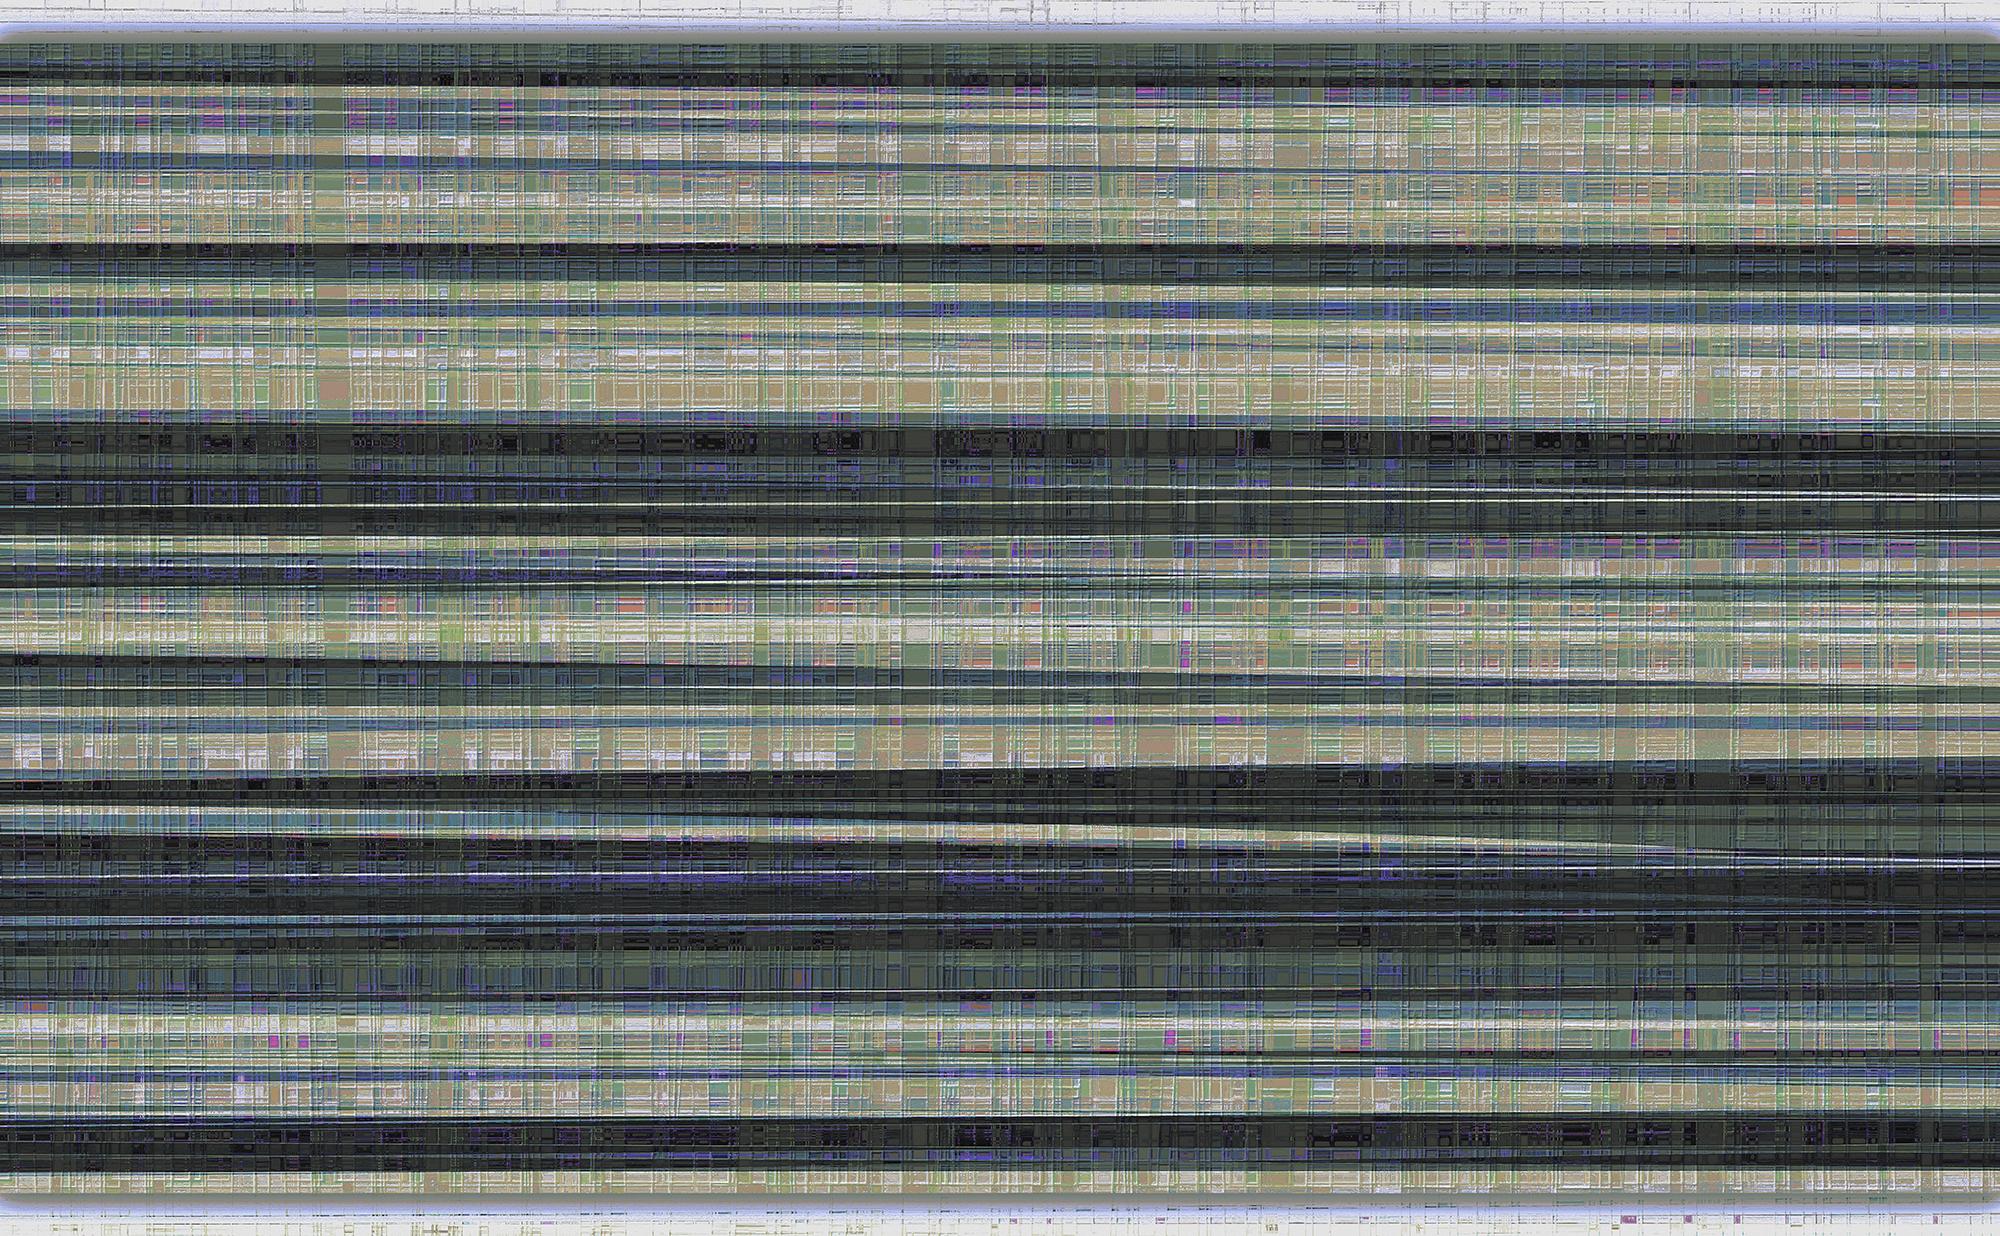 180806 Dirty Data